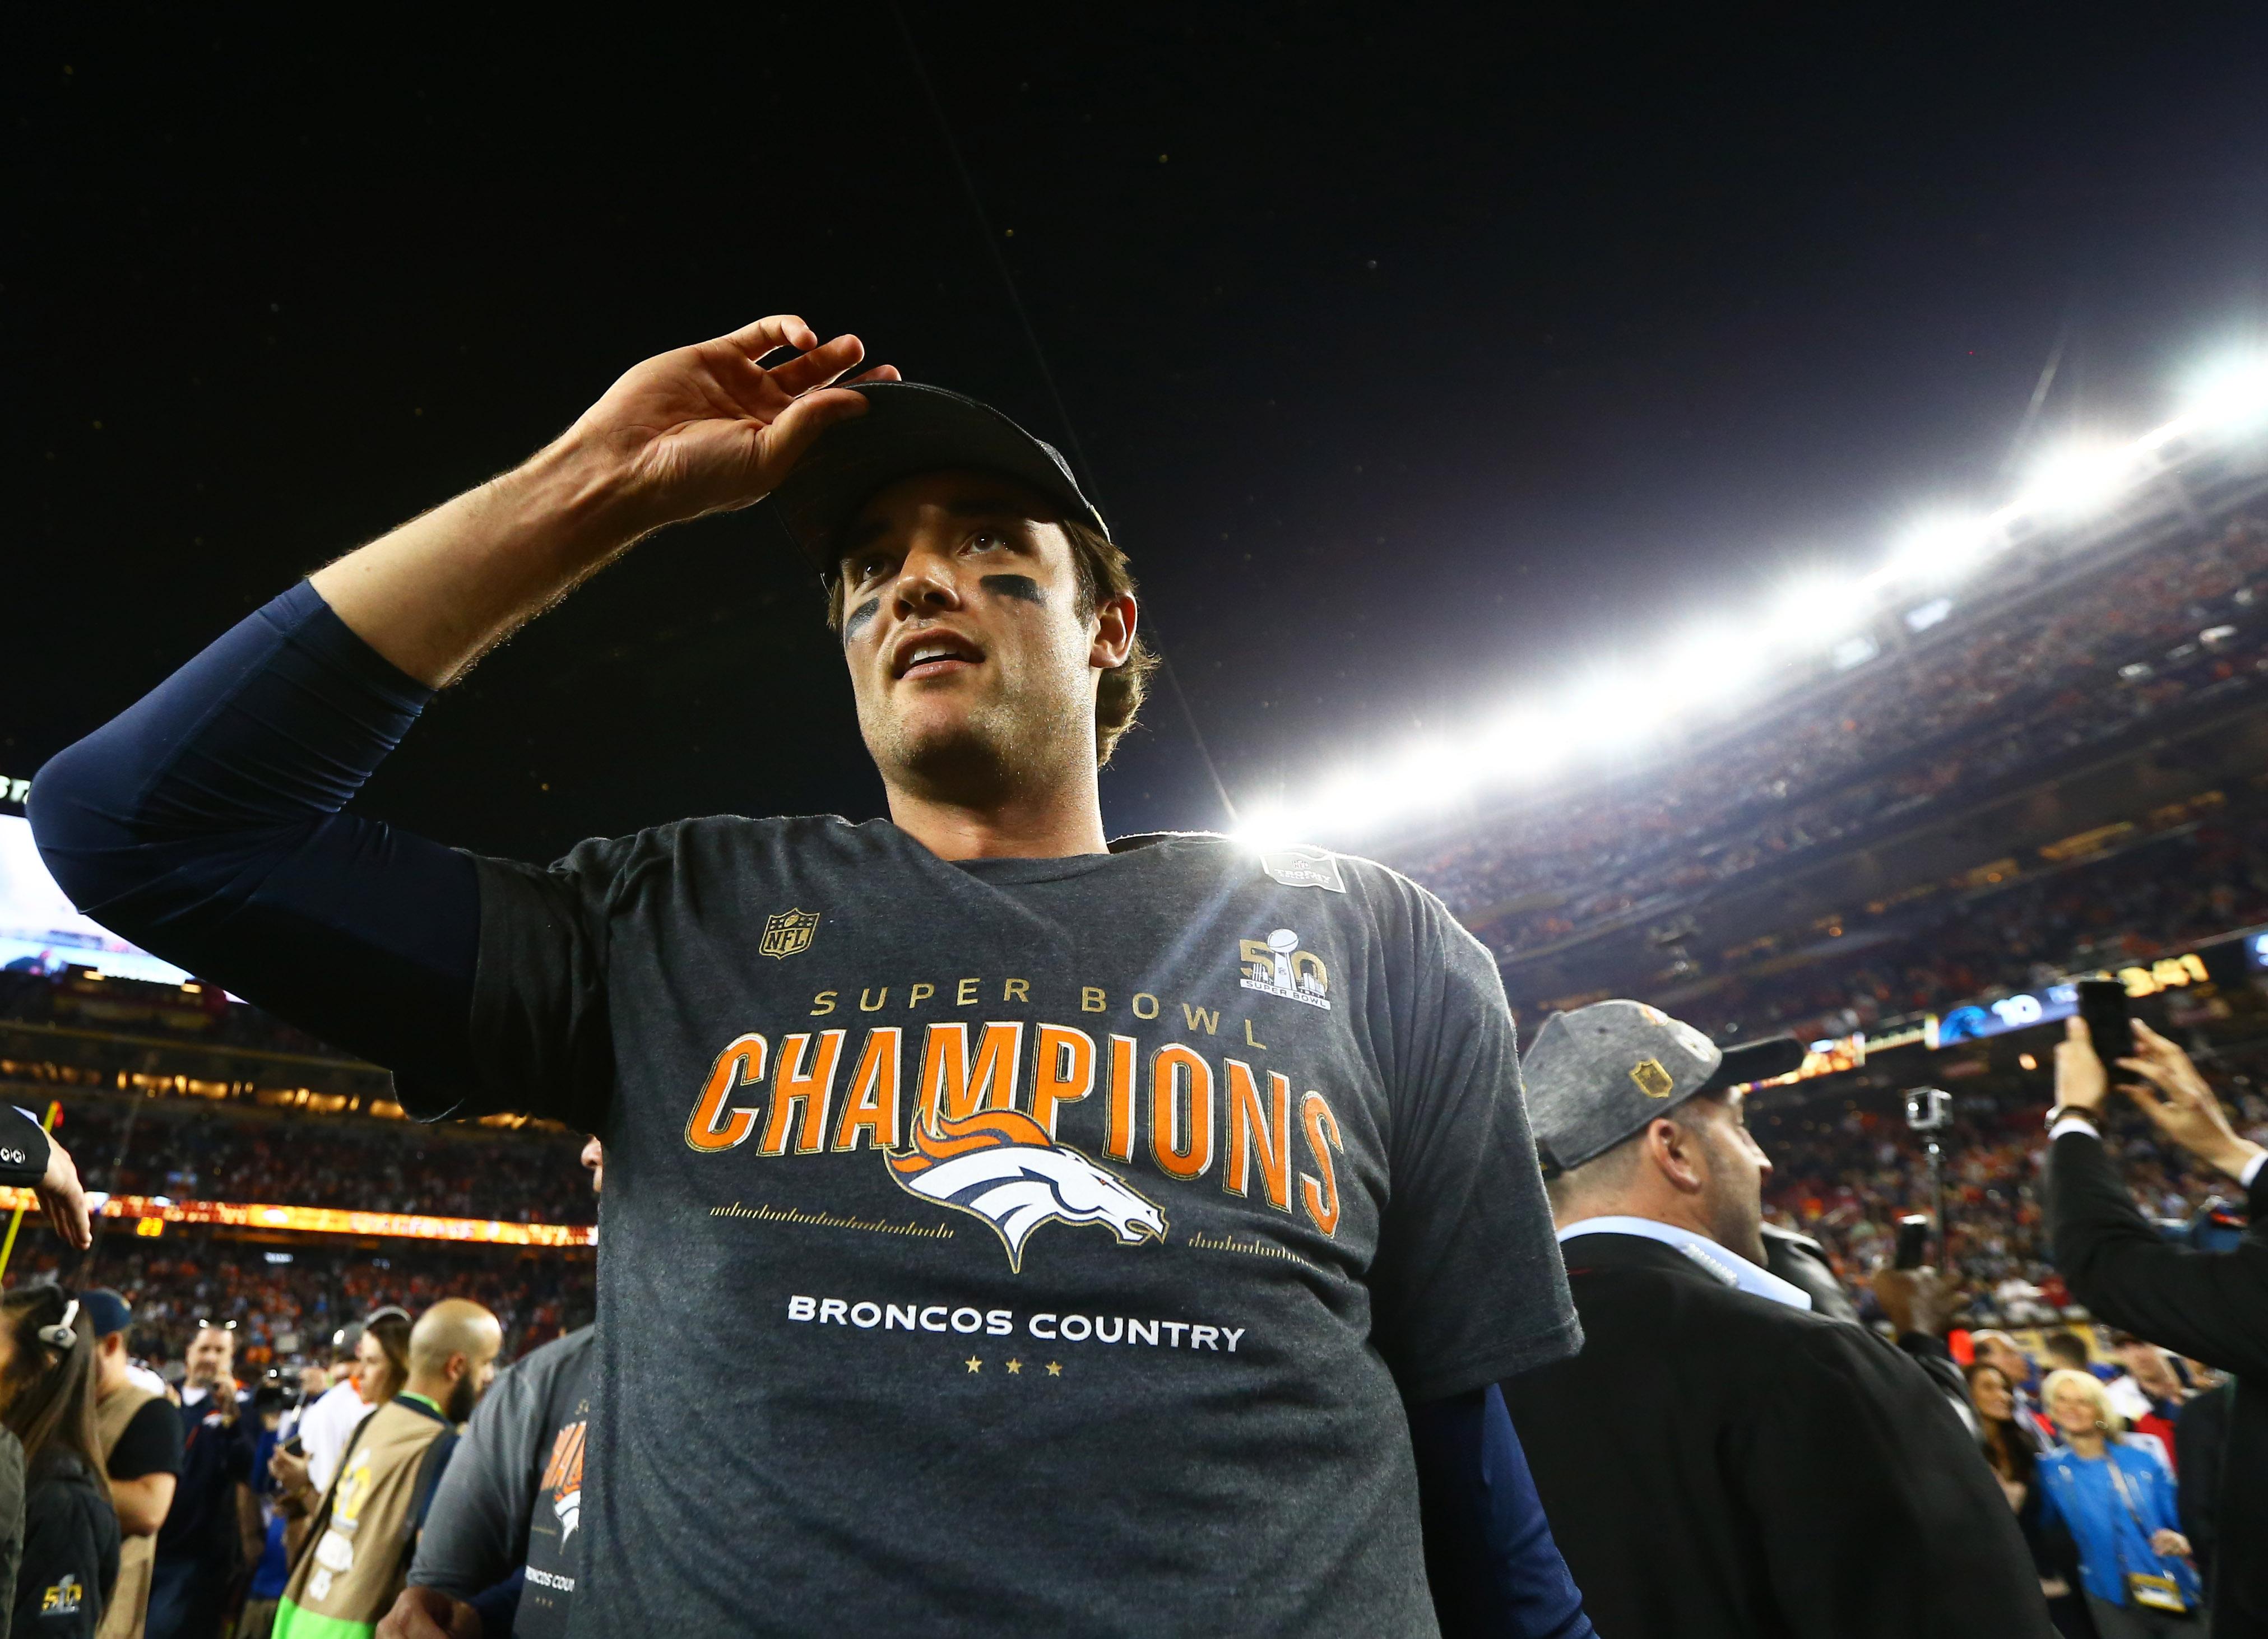 Brock Osweiler after the Broncos' Super Bowl victory